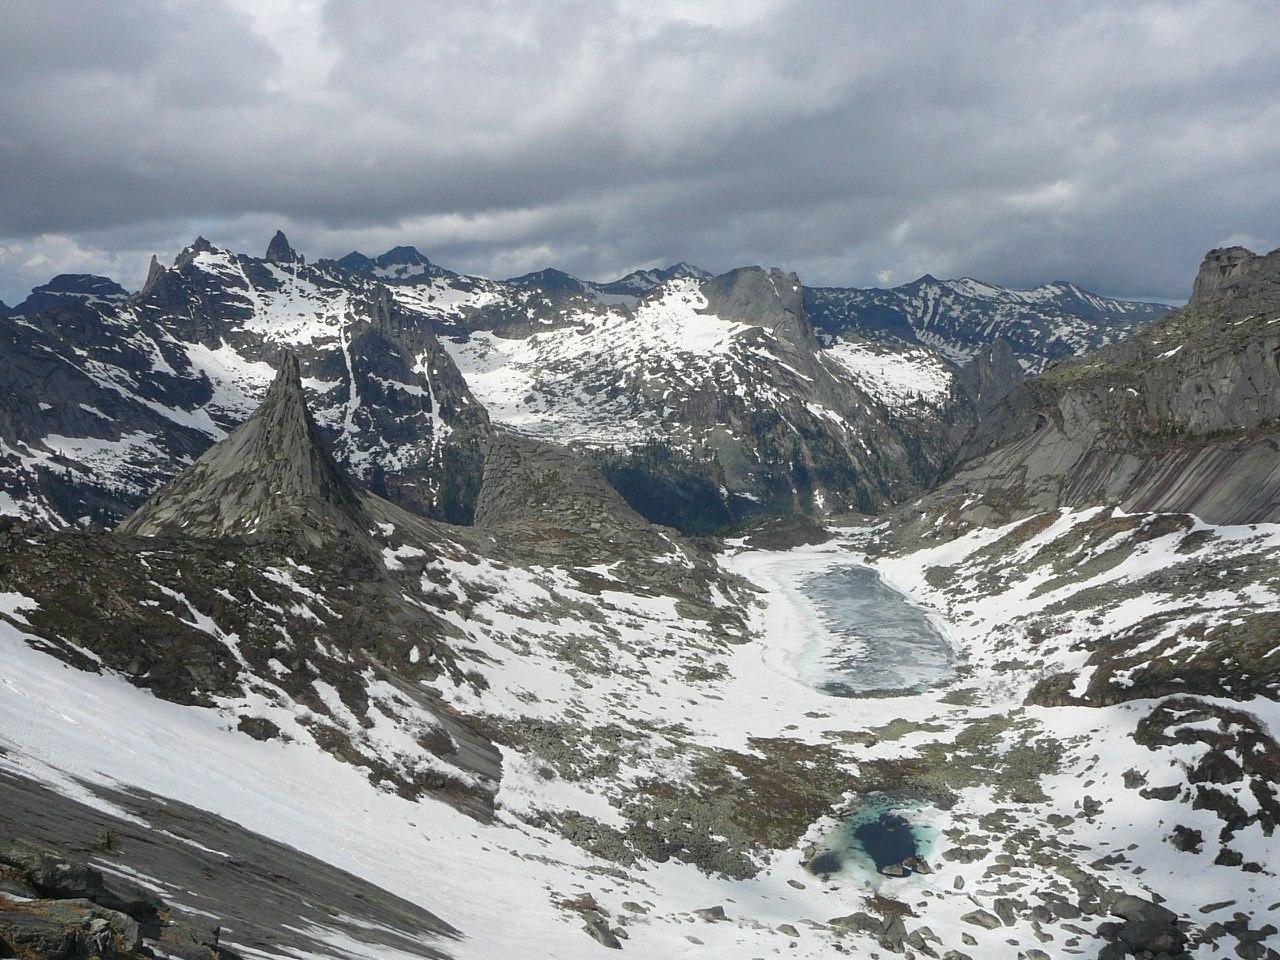 Озеро Горных духов с подъема в перевал Птица. Фото: Константин Бураков